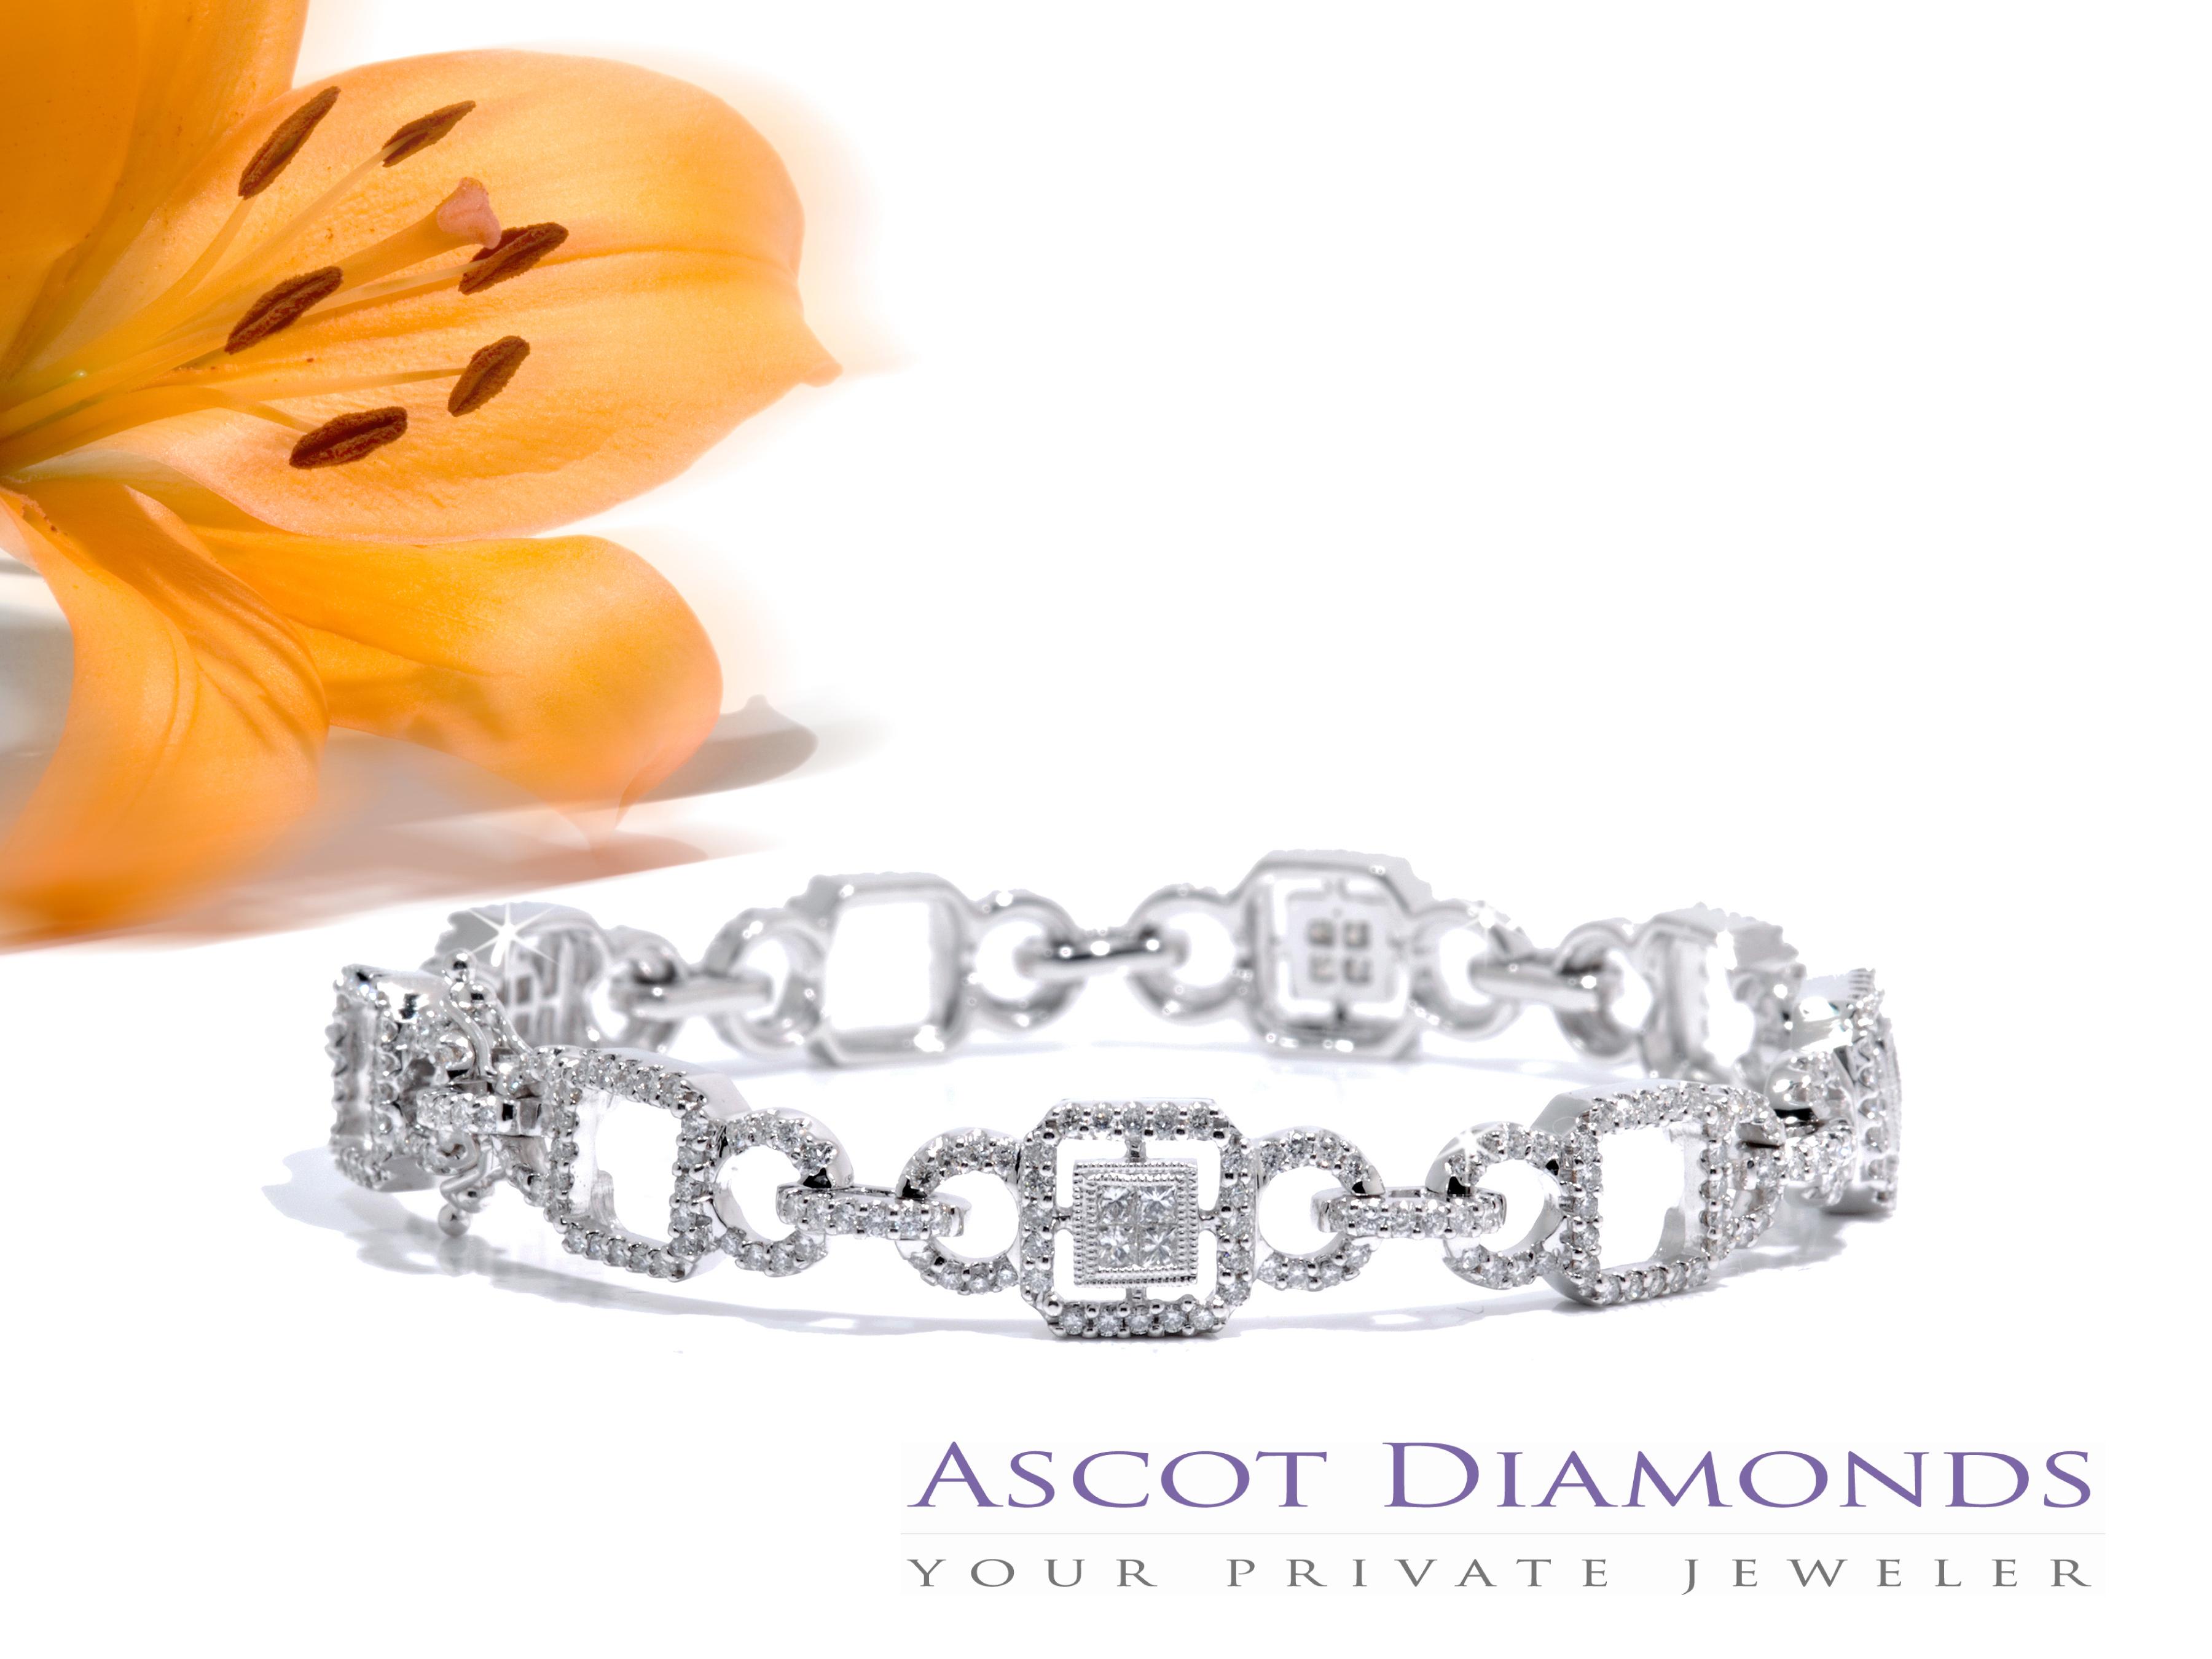 Jewelry, Bracelets, Bracelet, Diamond, Ascot diamonds, private jewelers